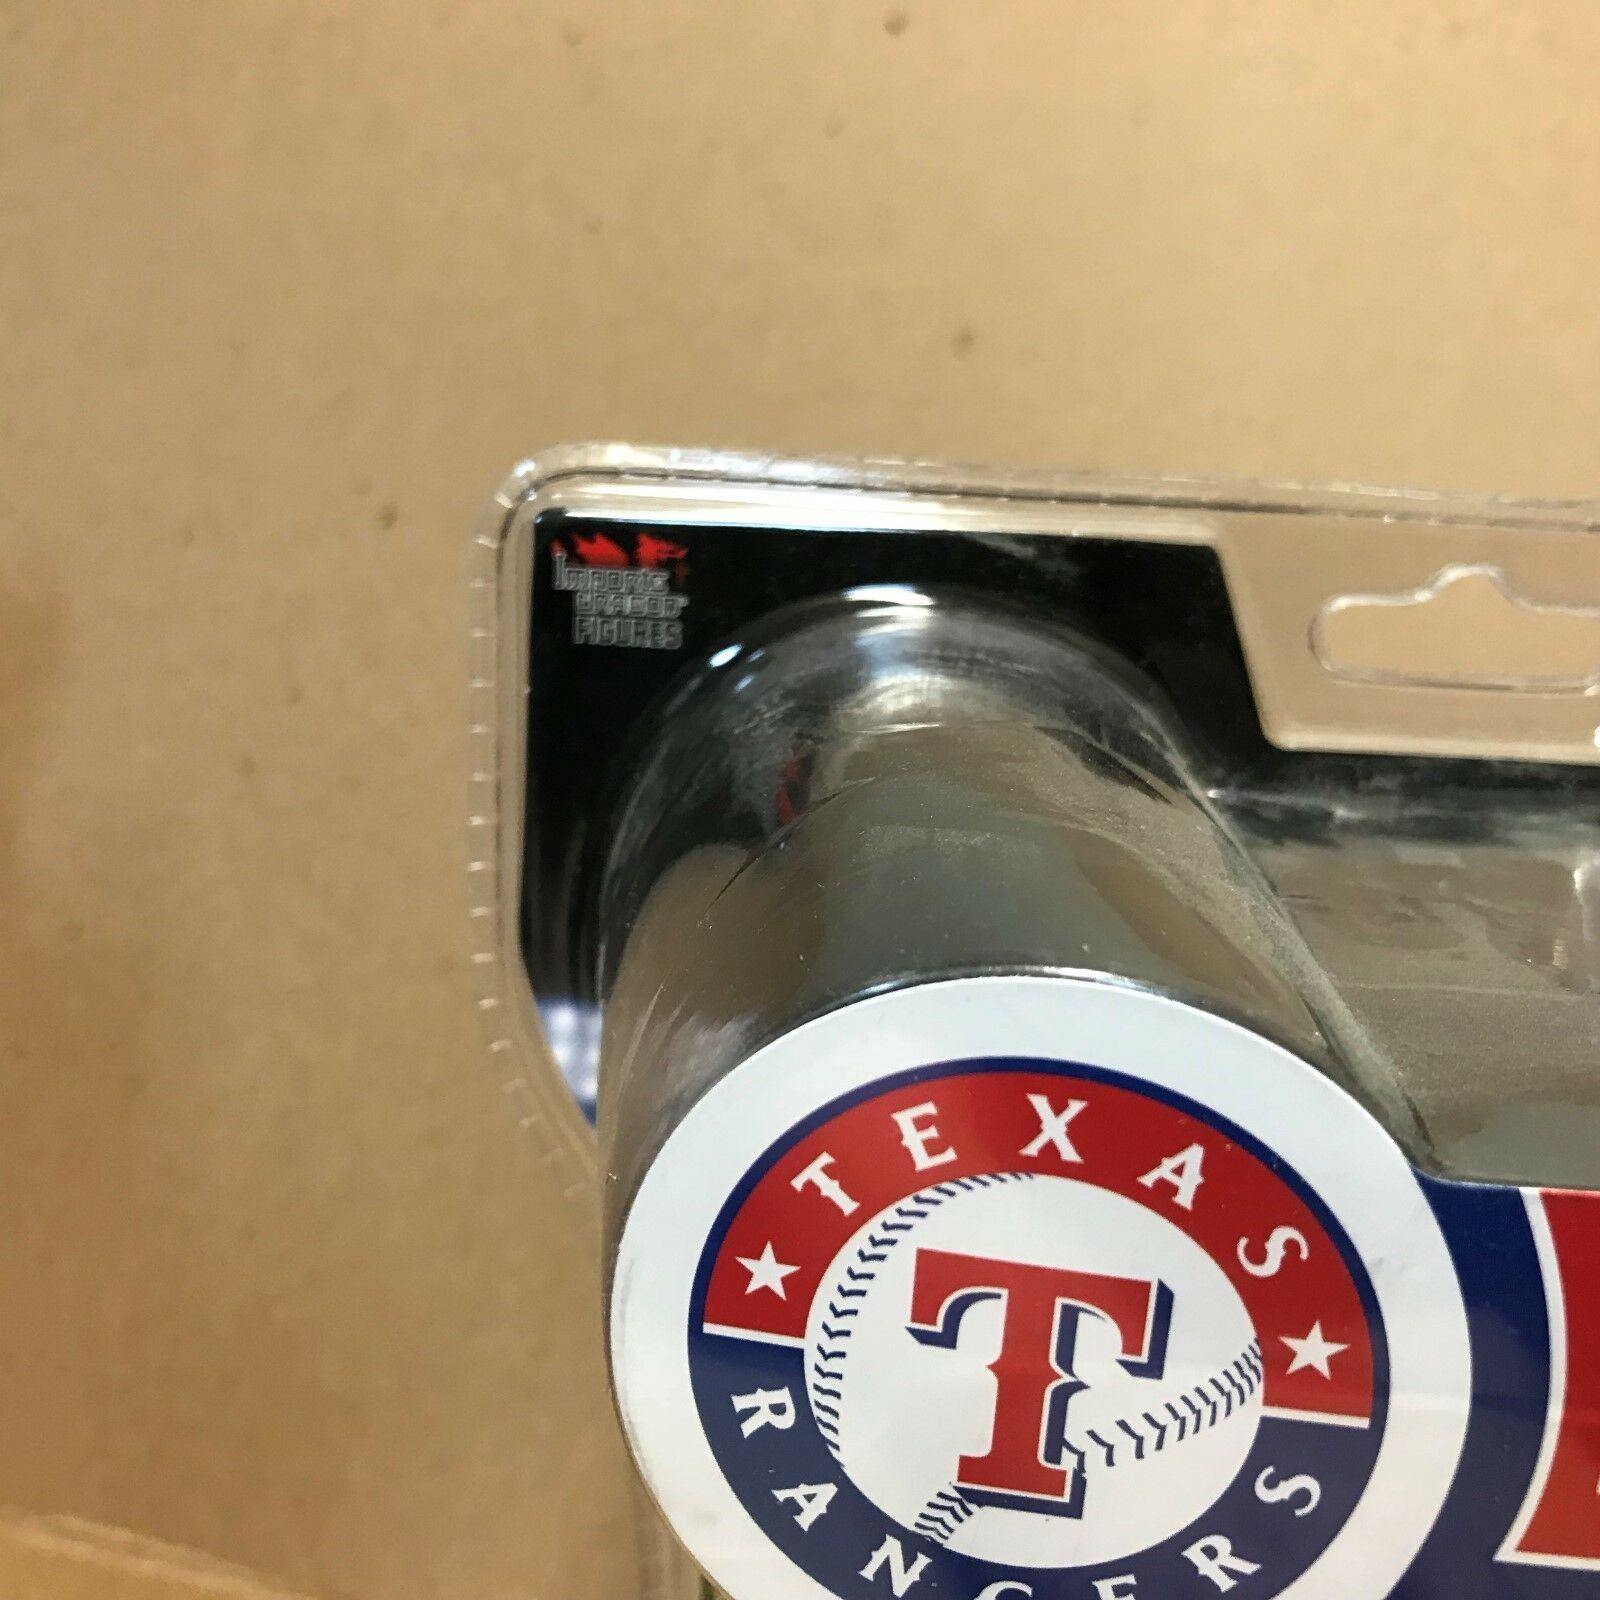 Prince Fielder 84 Texas Rangers MLB import dragon baseball figurine